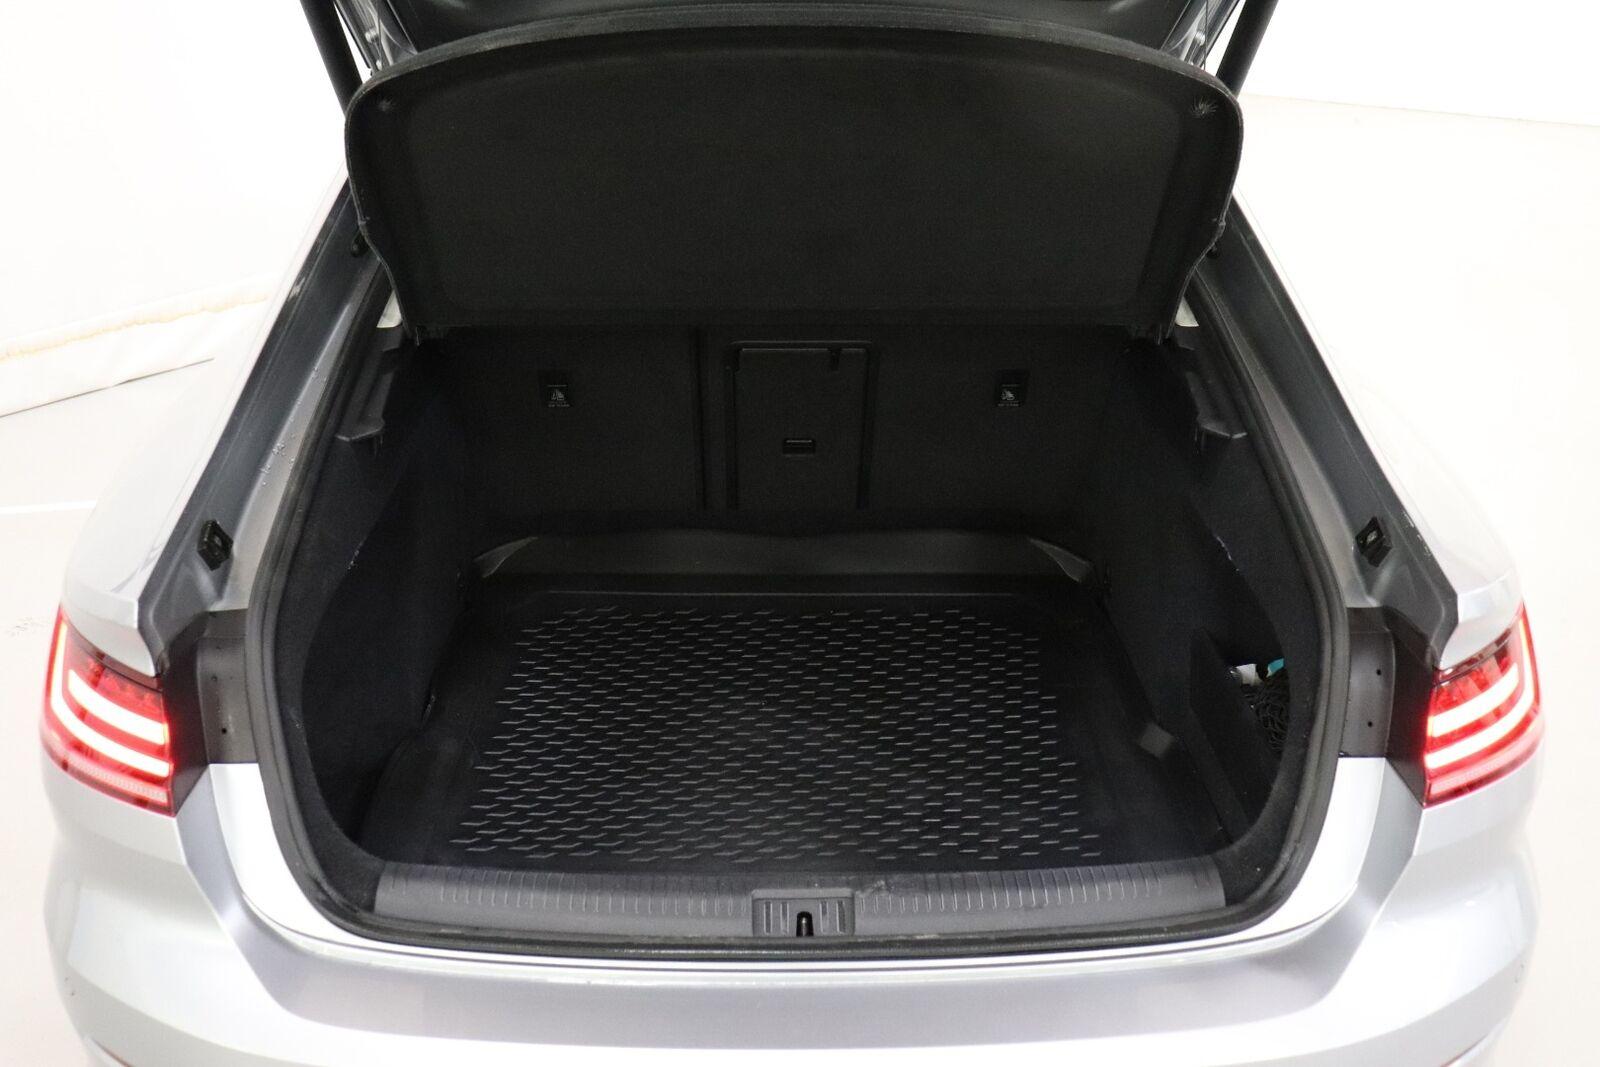 VW Arteon 2,0 TDi 150 Elegance DSG